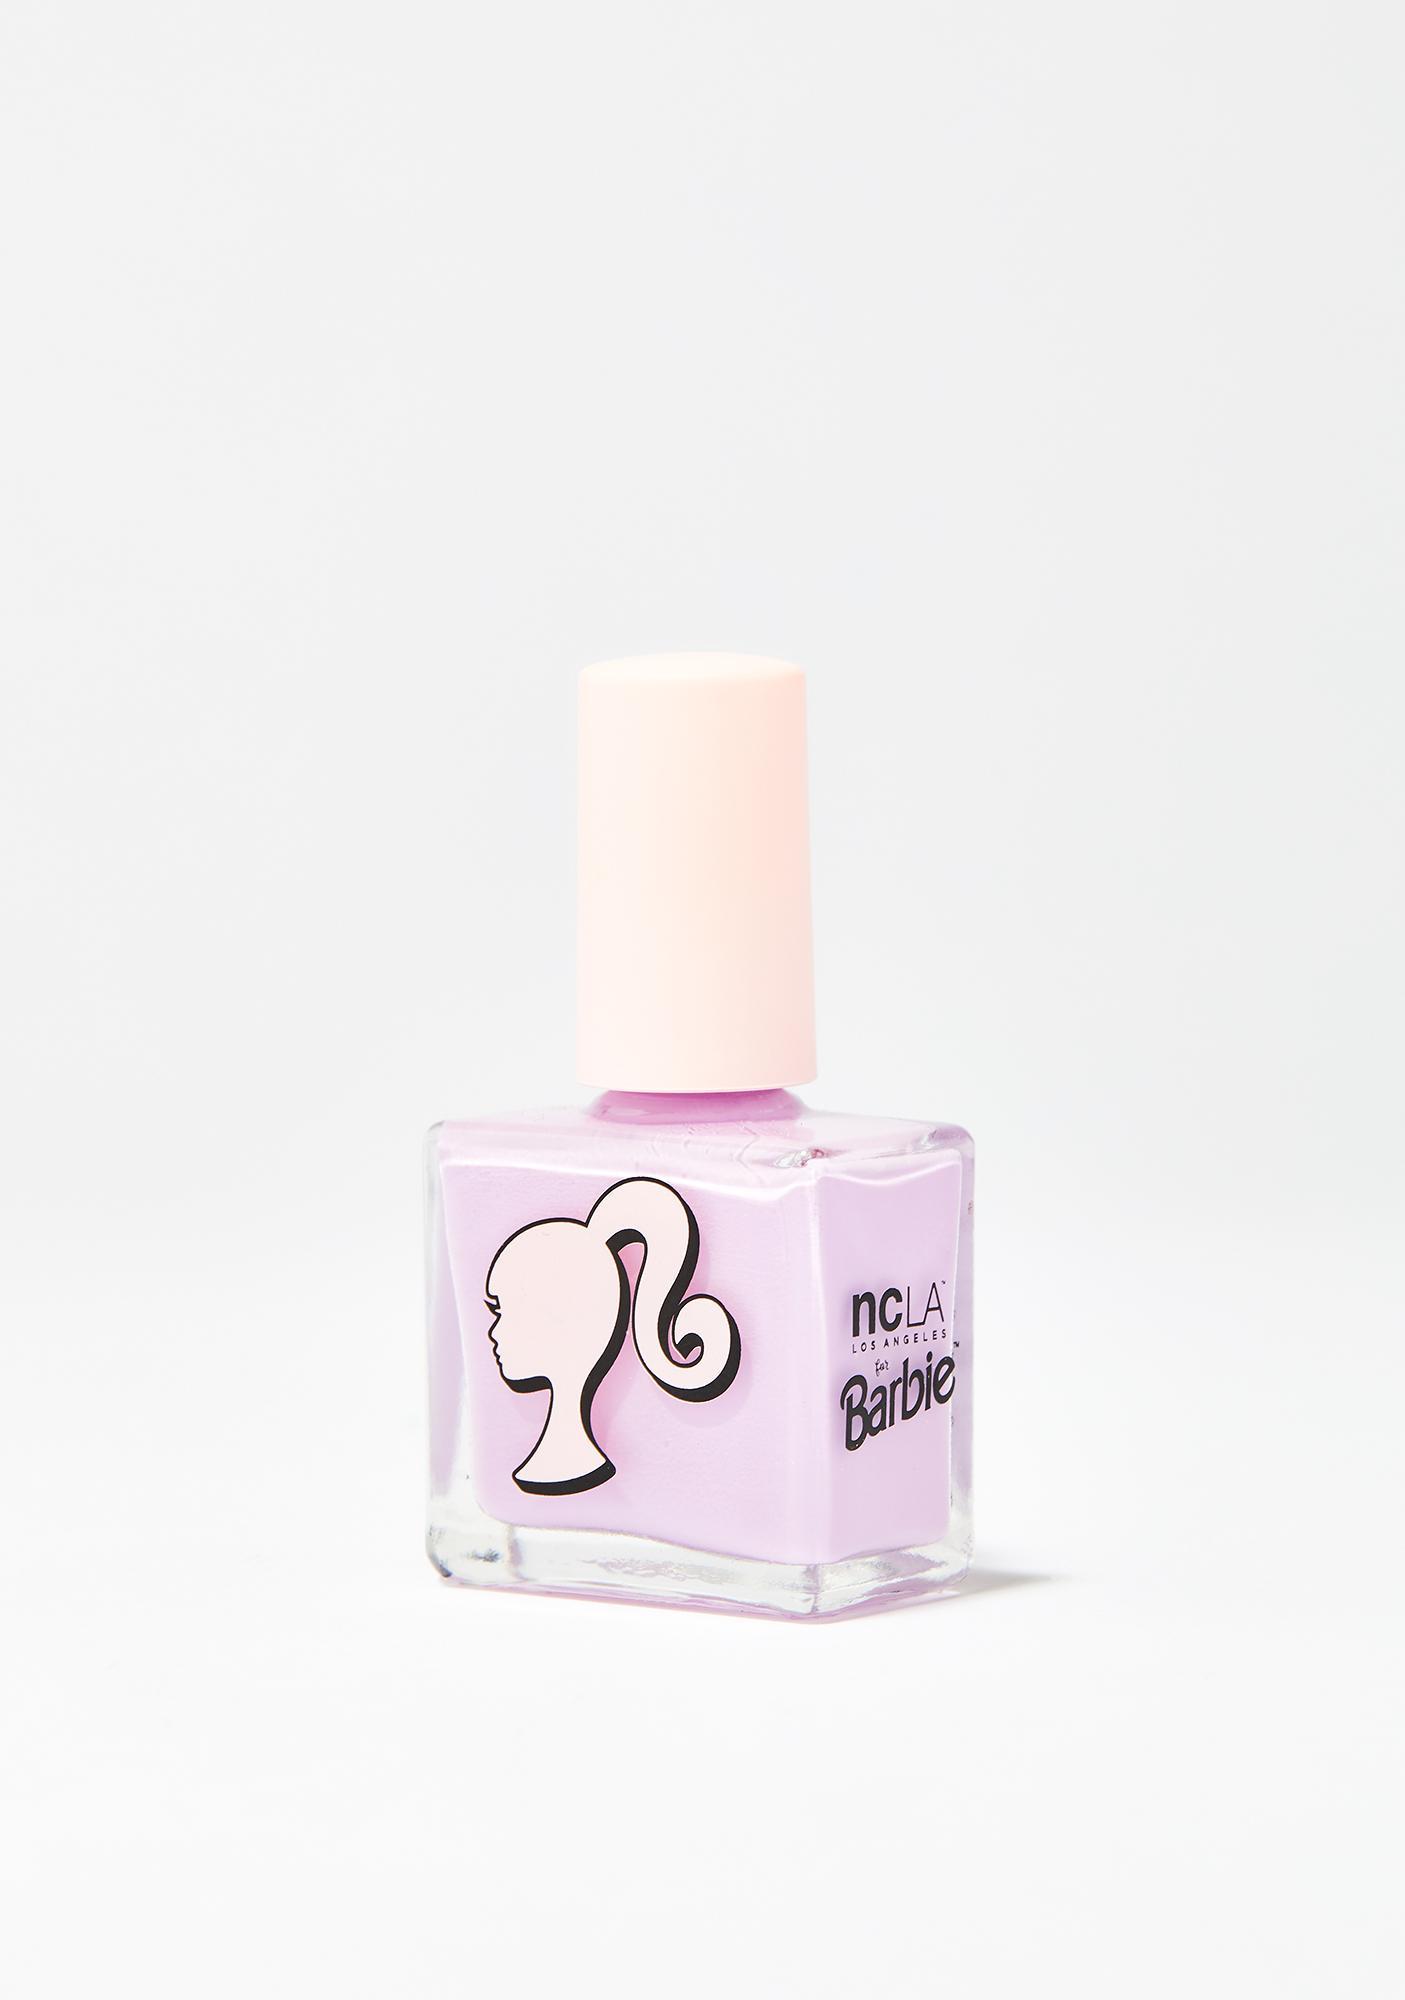 NCLA Barbie Dreamhouse Nail Lacquer